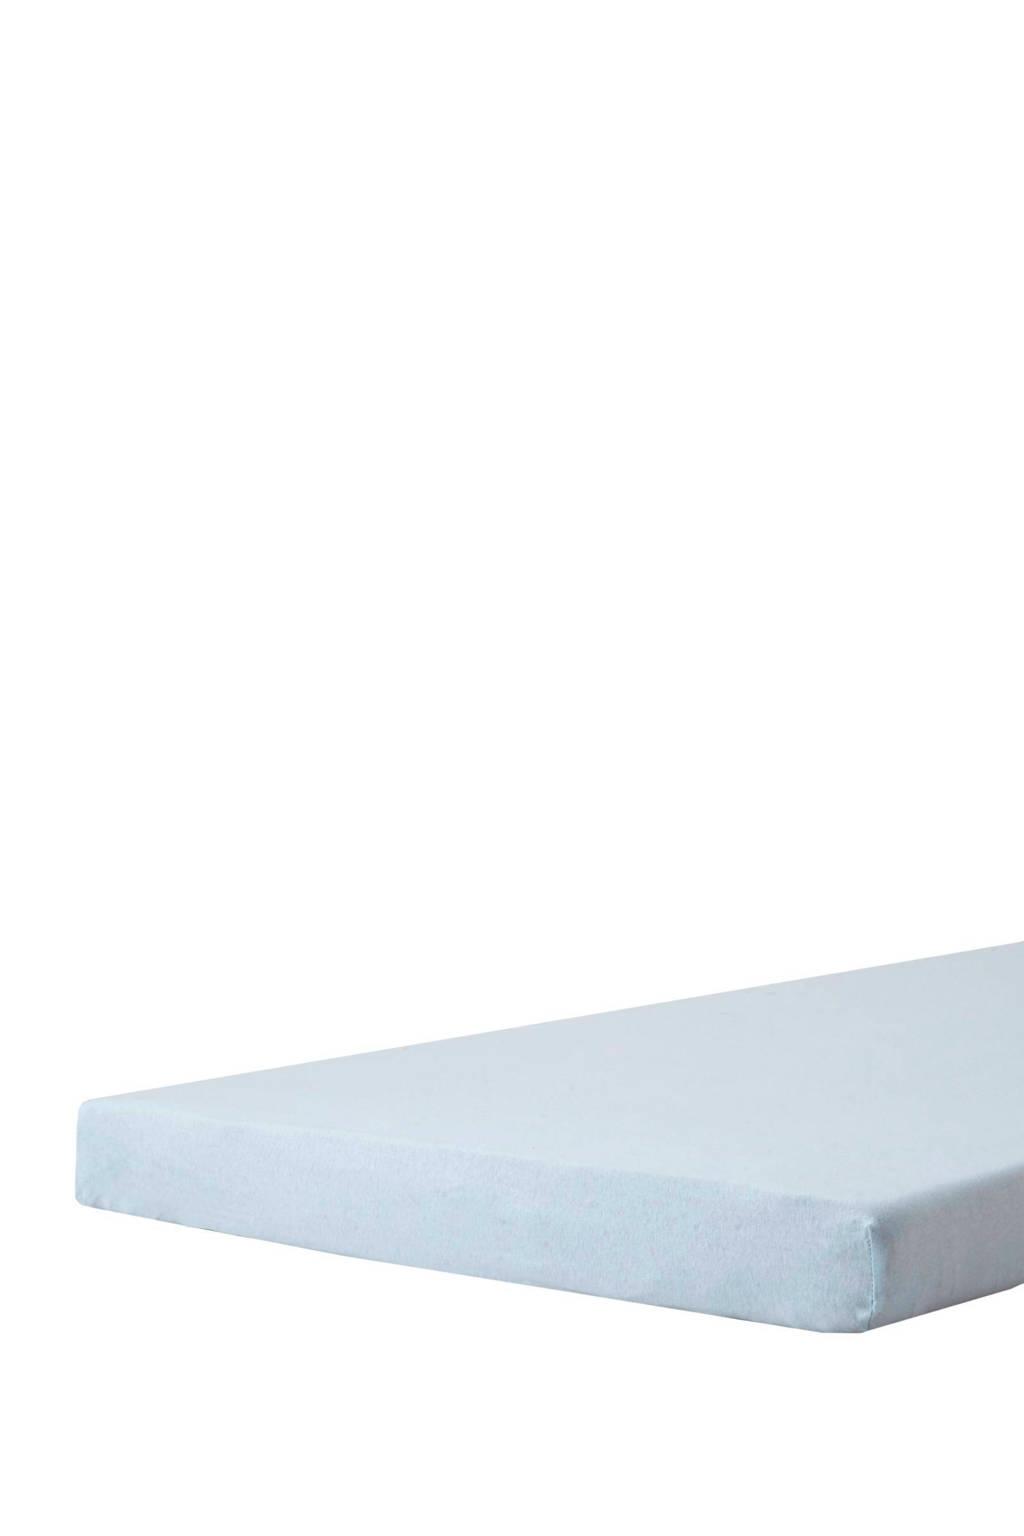 Beddinghouse jersey topmatras hoeslaken Lichtblauw